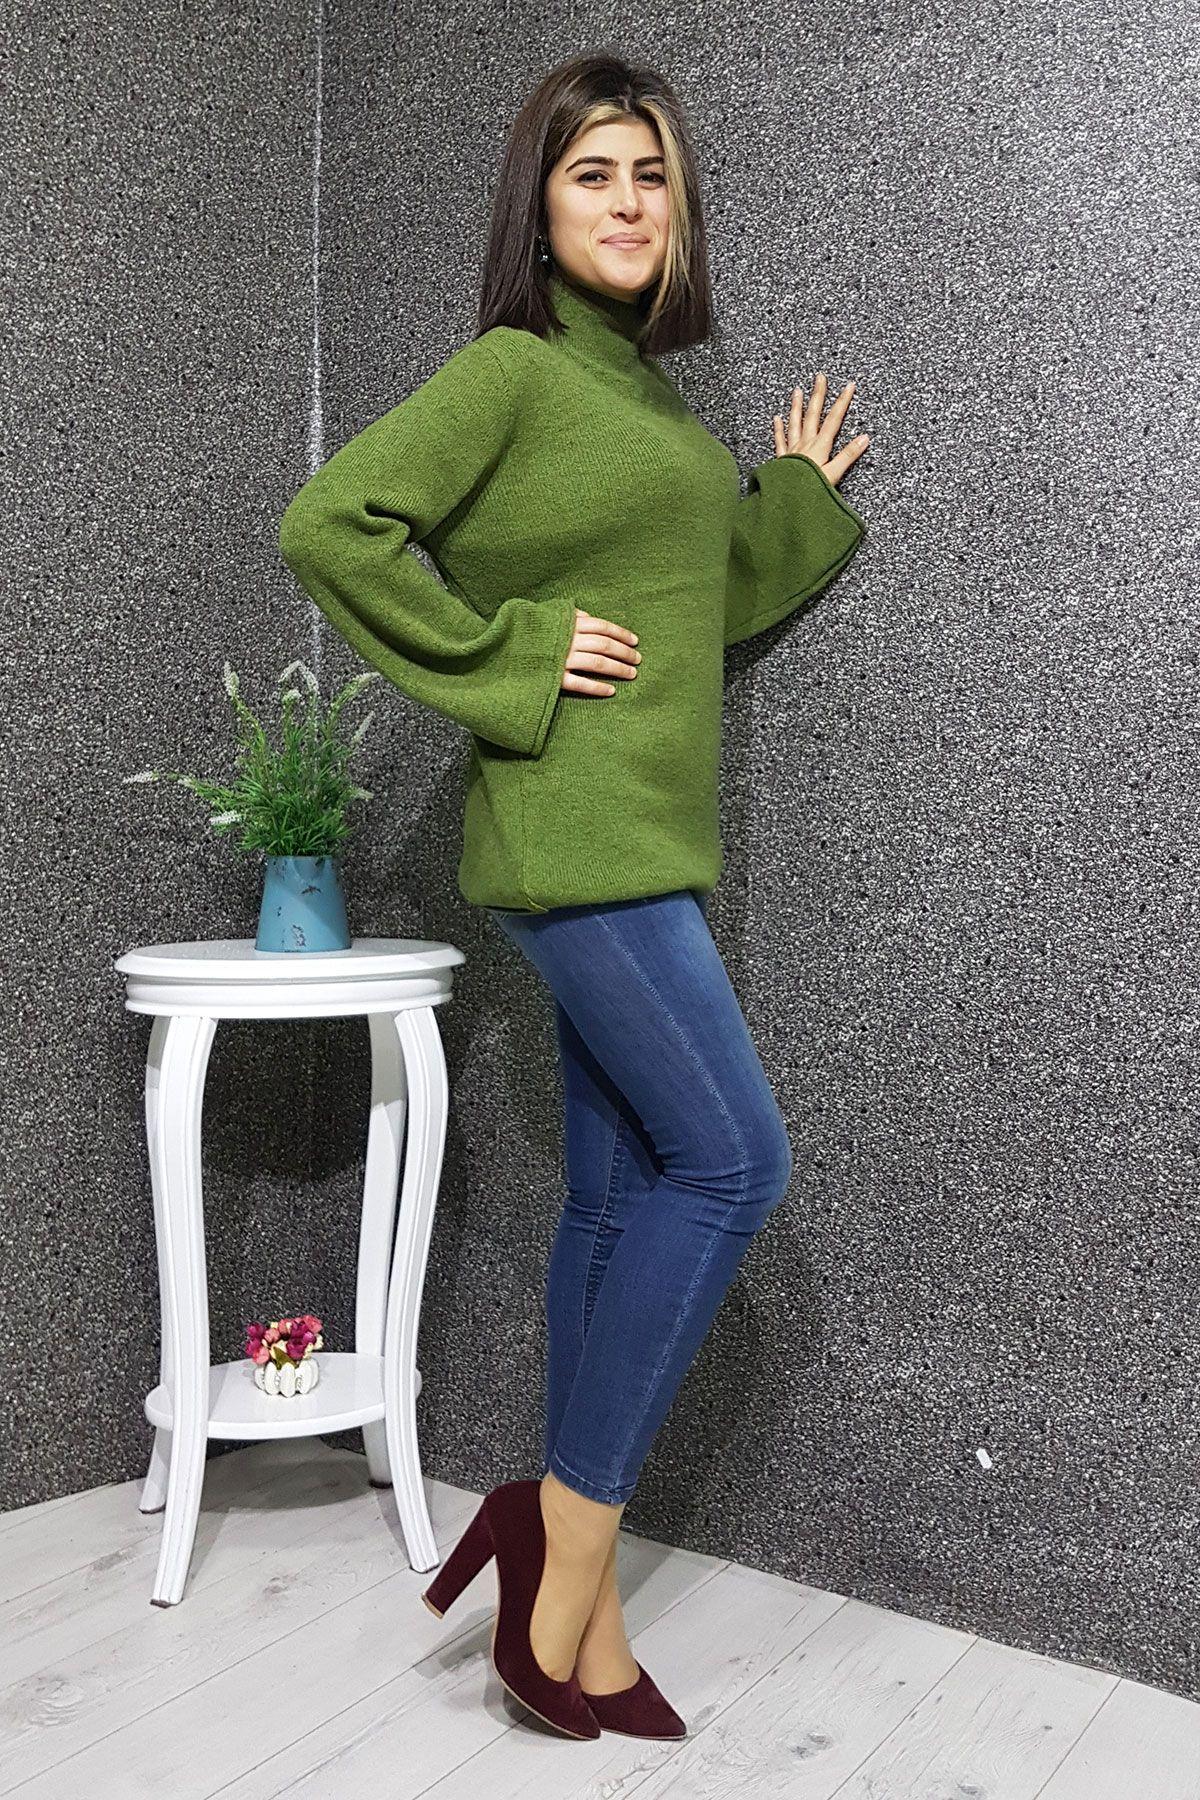 Dik Yaka Triko Bayan Salas Kazak Kadin Giyim Moda Stilleri Triko